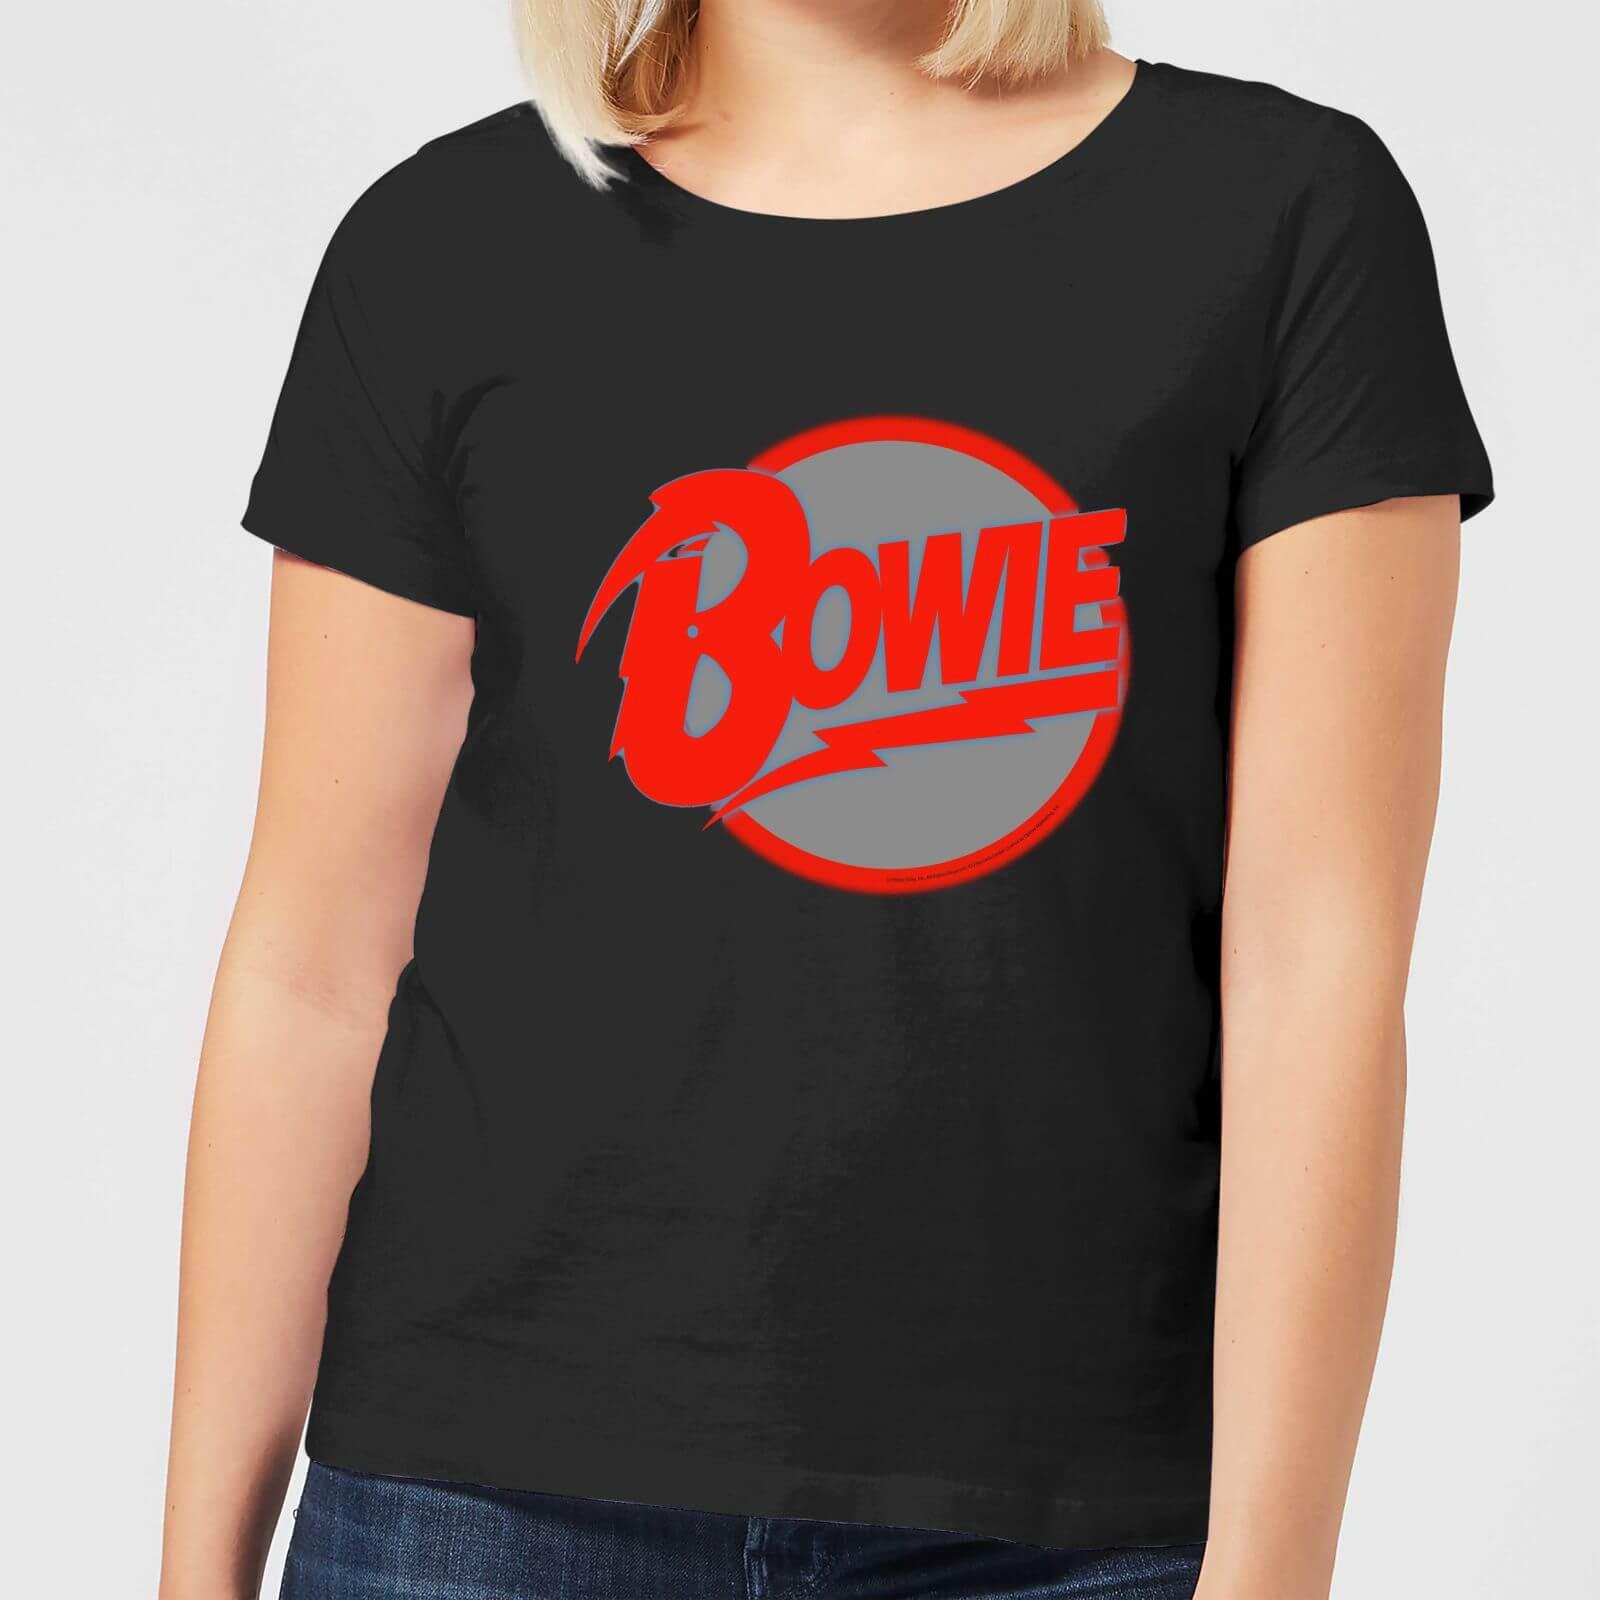 David Bowie Diamond Dogs Women's T-Shirt - Black - XXL - Black